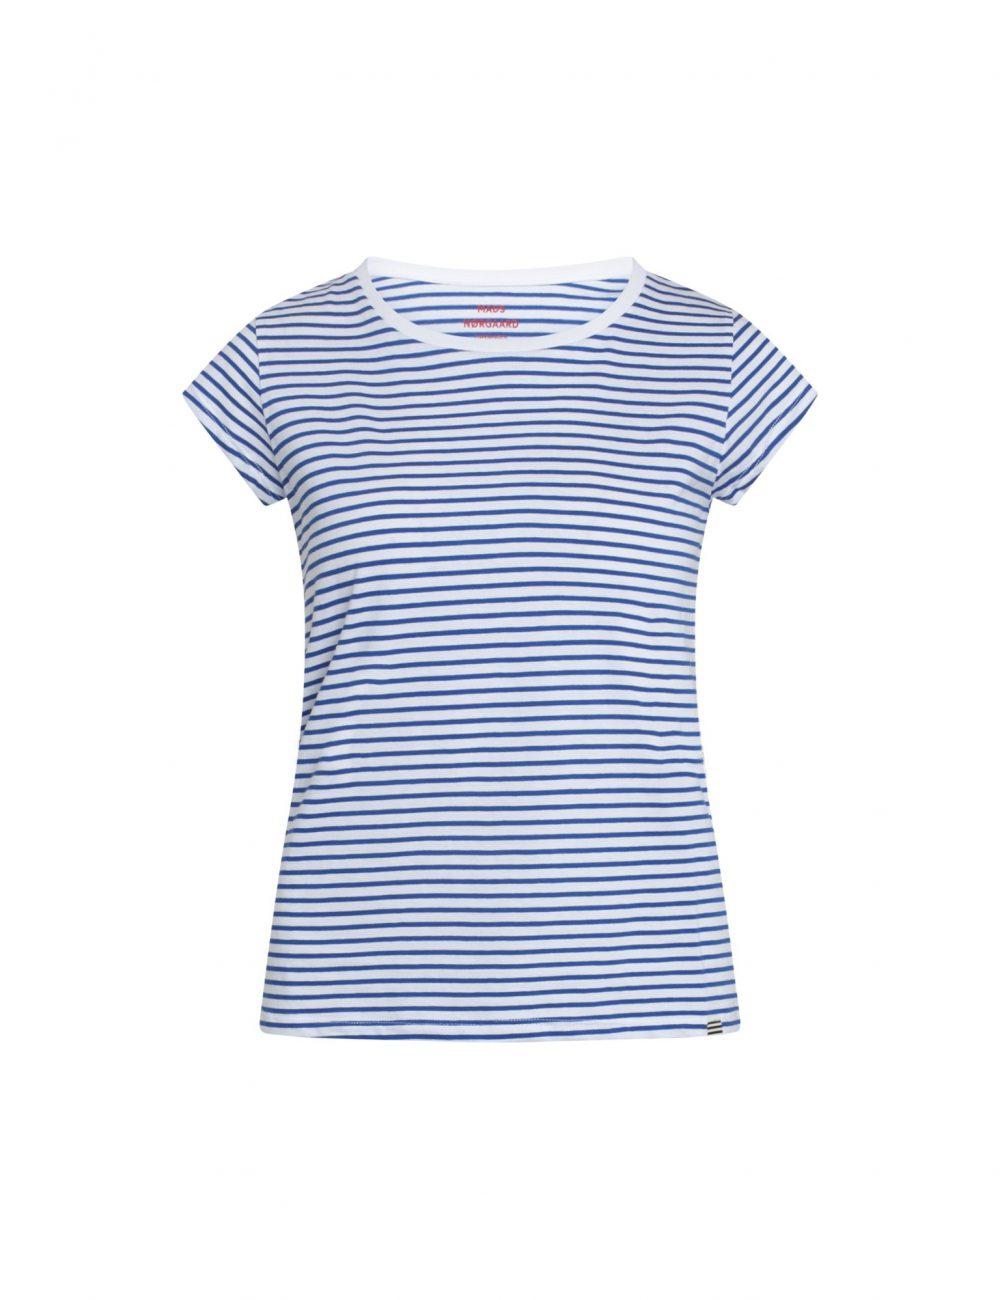 Favorite Stripe Shirt White/Princess